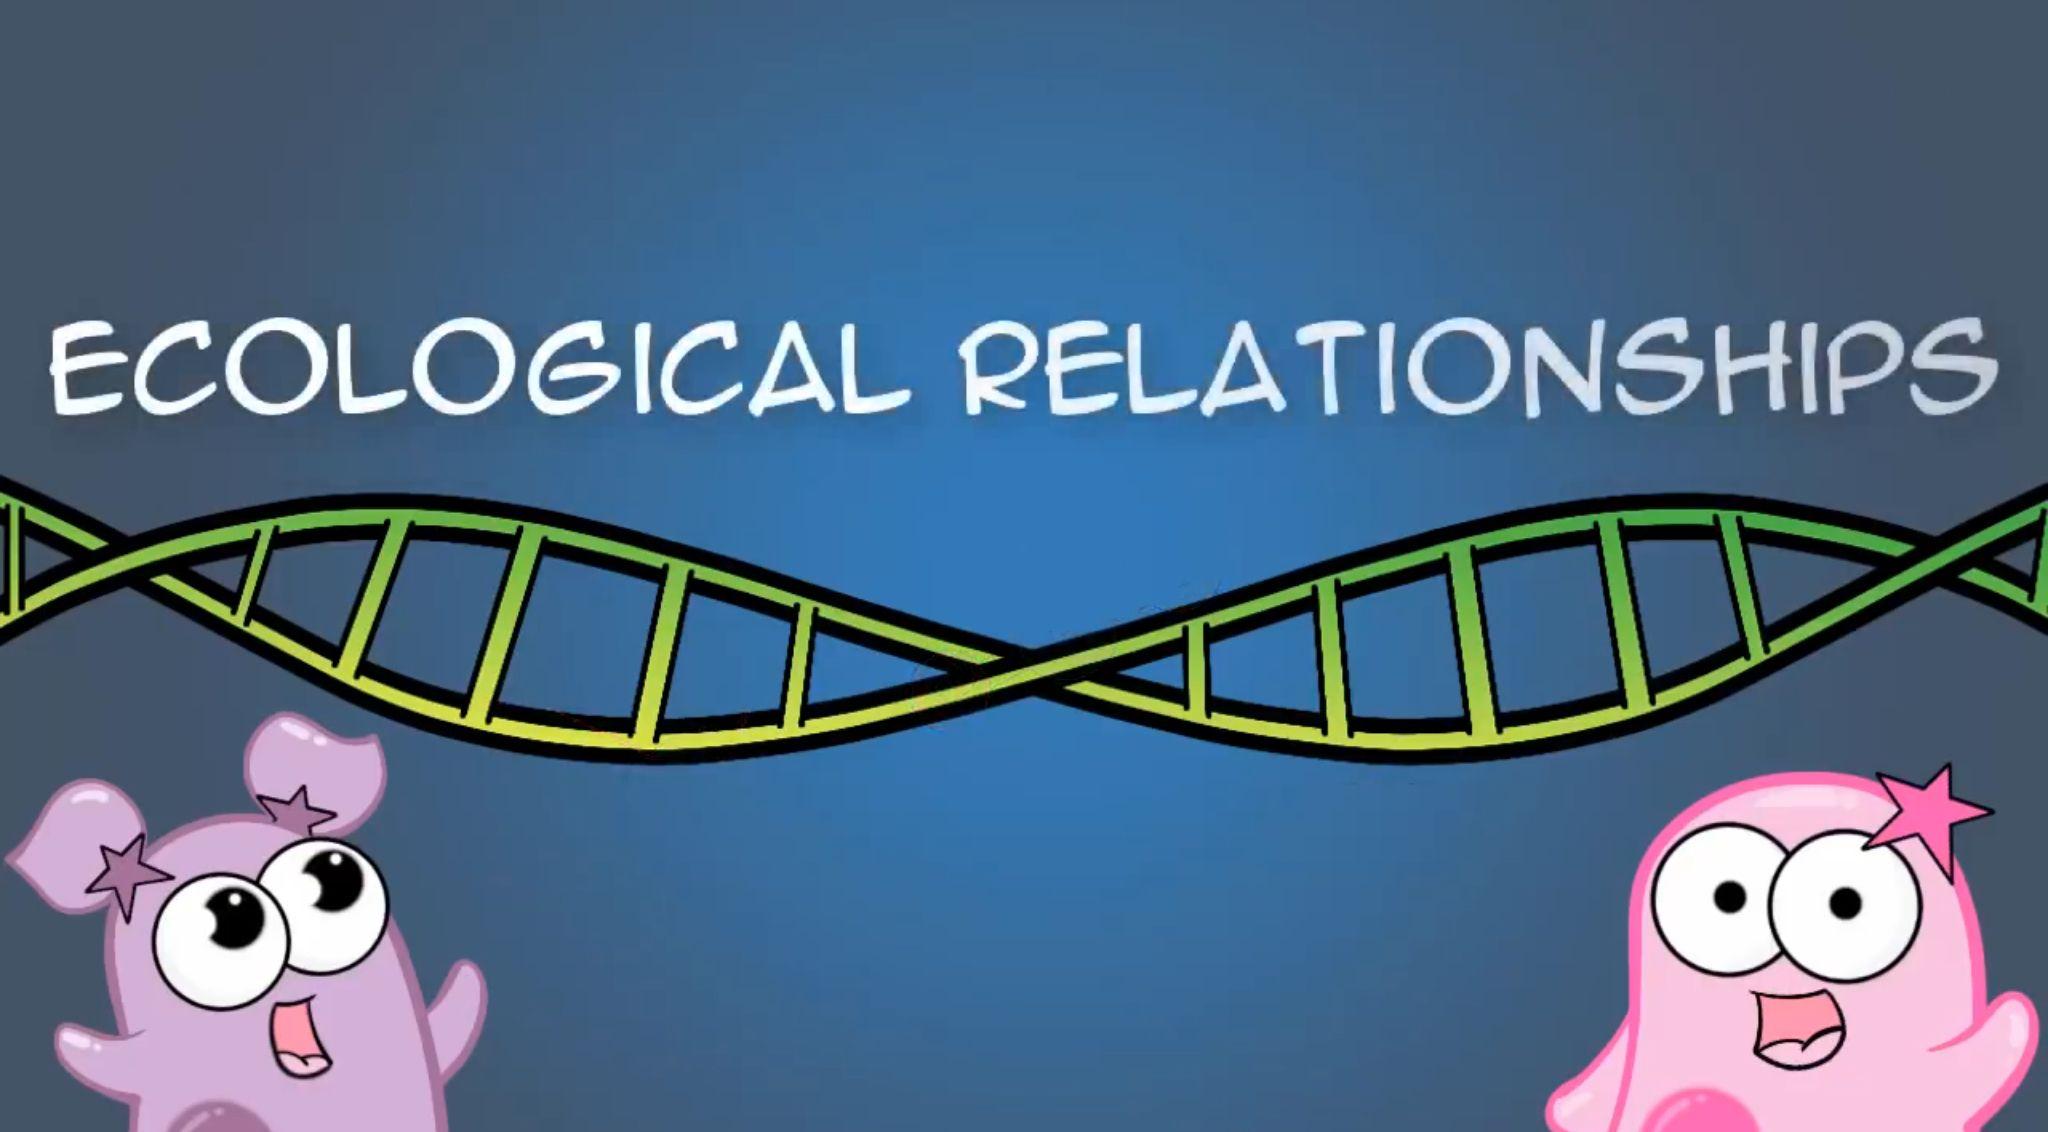 Ecological Relationships Amoeba Sisters Video Tuesday